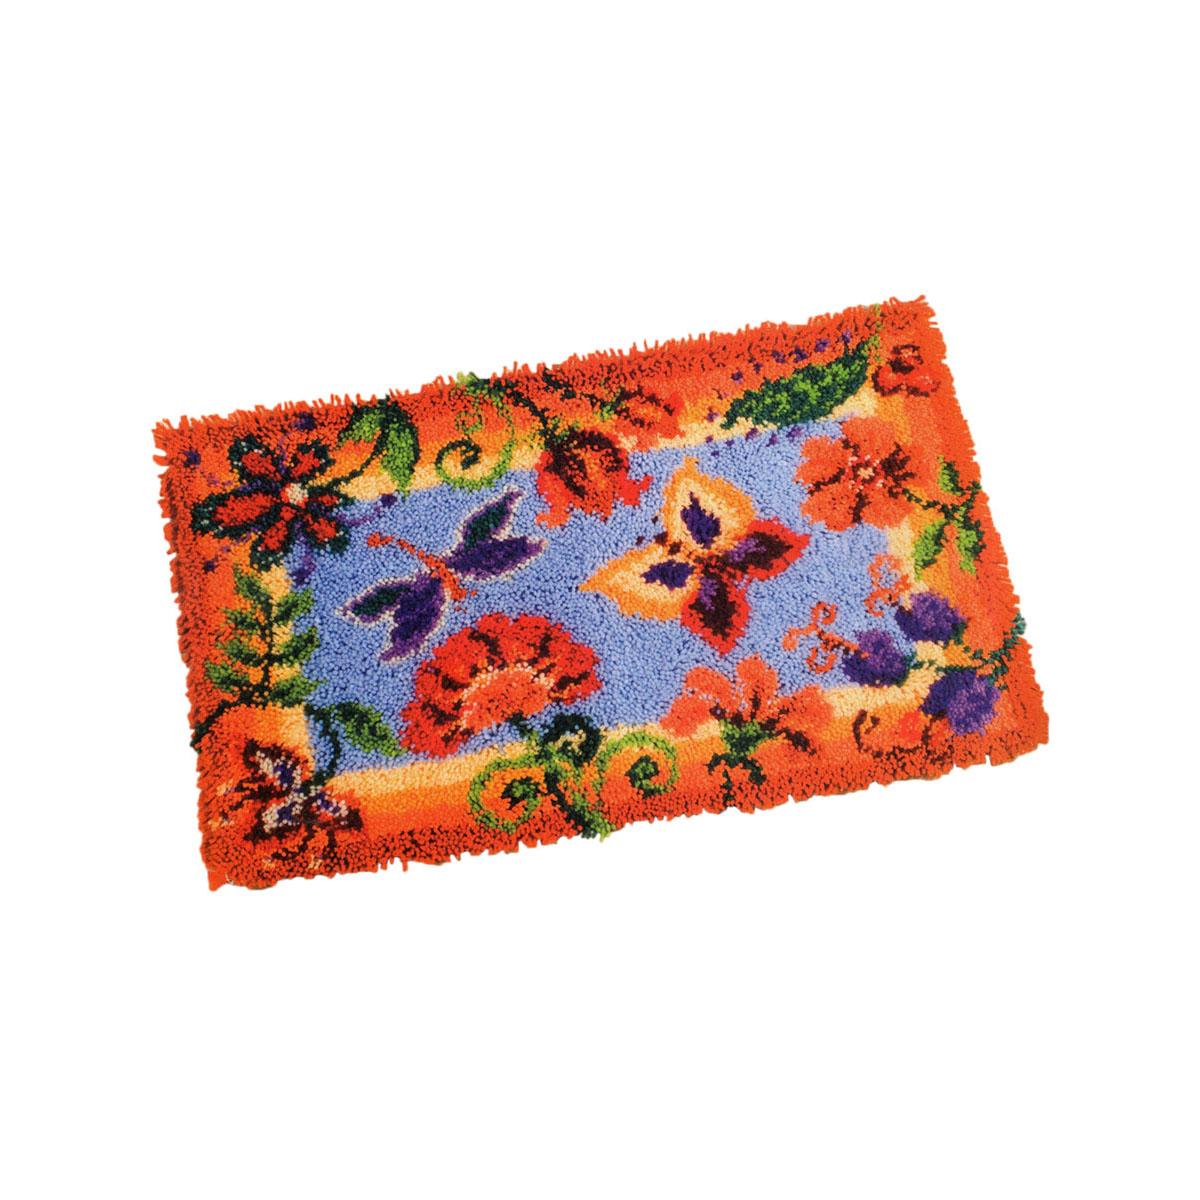 0145323-PN Коврик (ковровая техника) Vervaco 'Декоративные цветы' 65x40 см